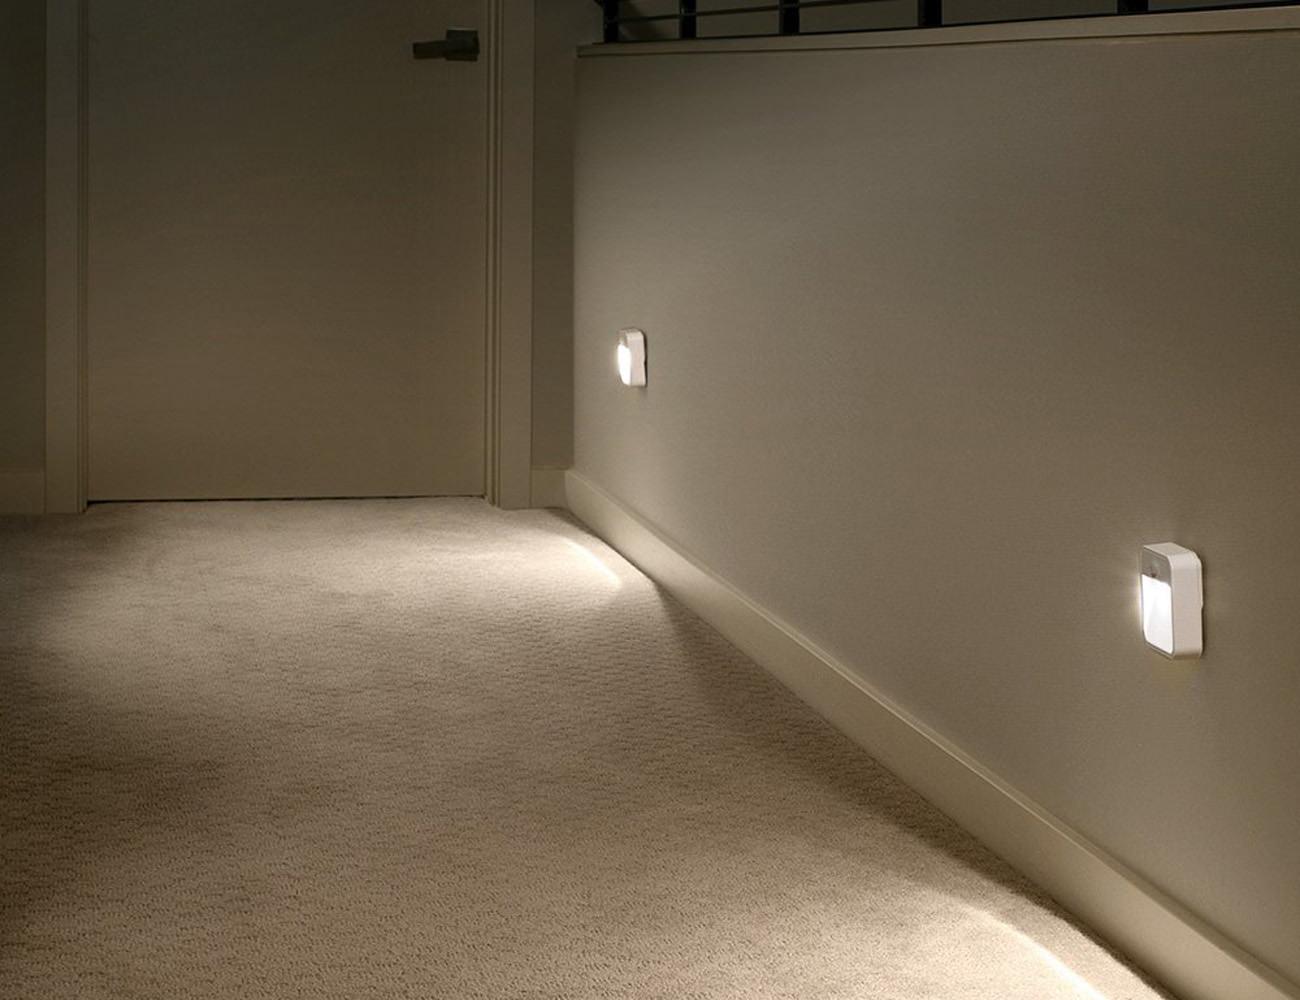 Mr. Beams Wireless Motion Sensing LED Nightlights